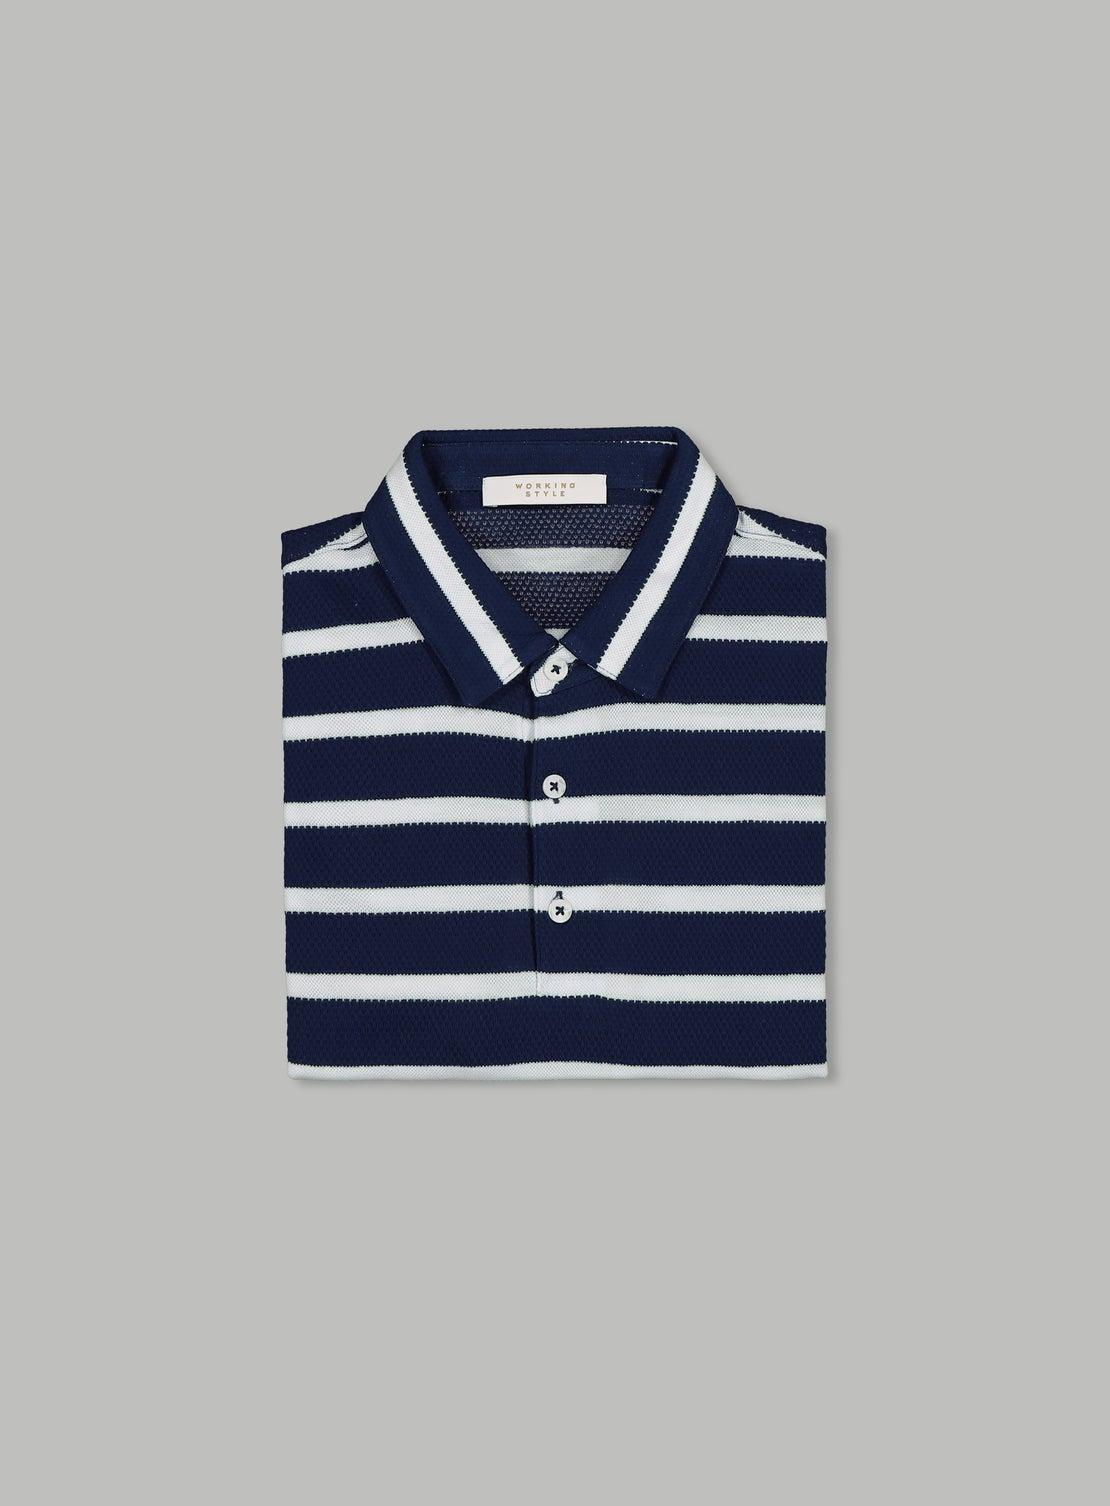 Roberto Blue Stripe Polo